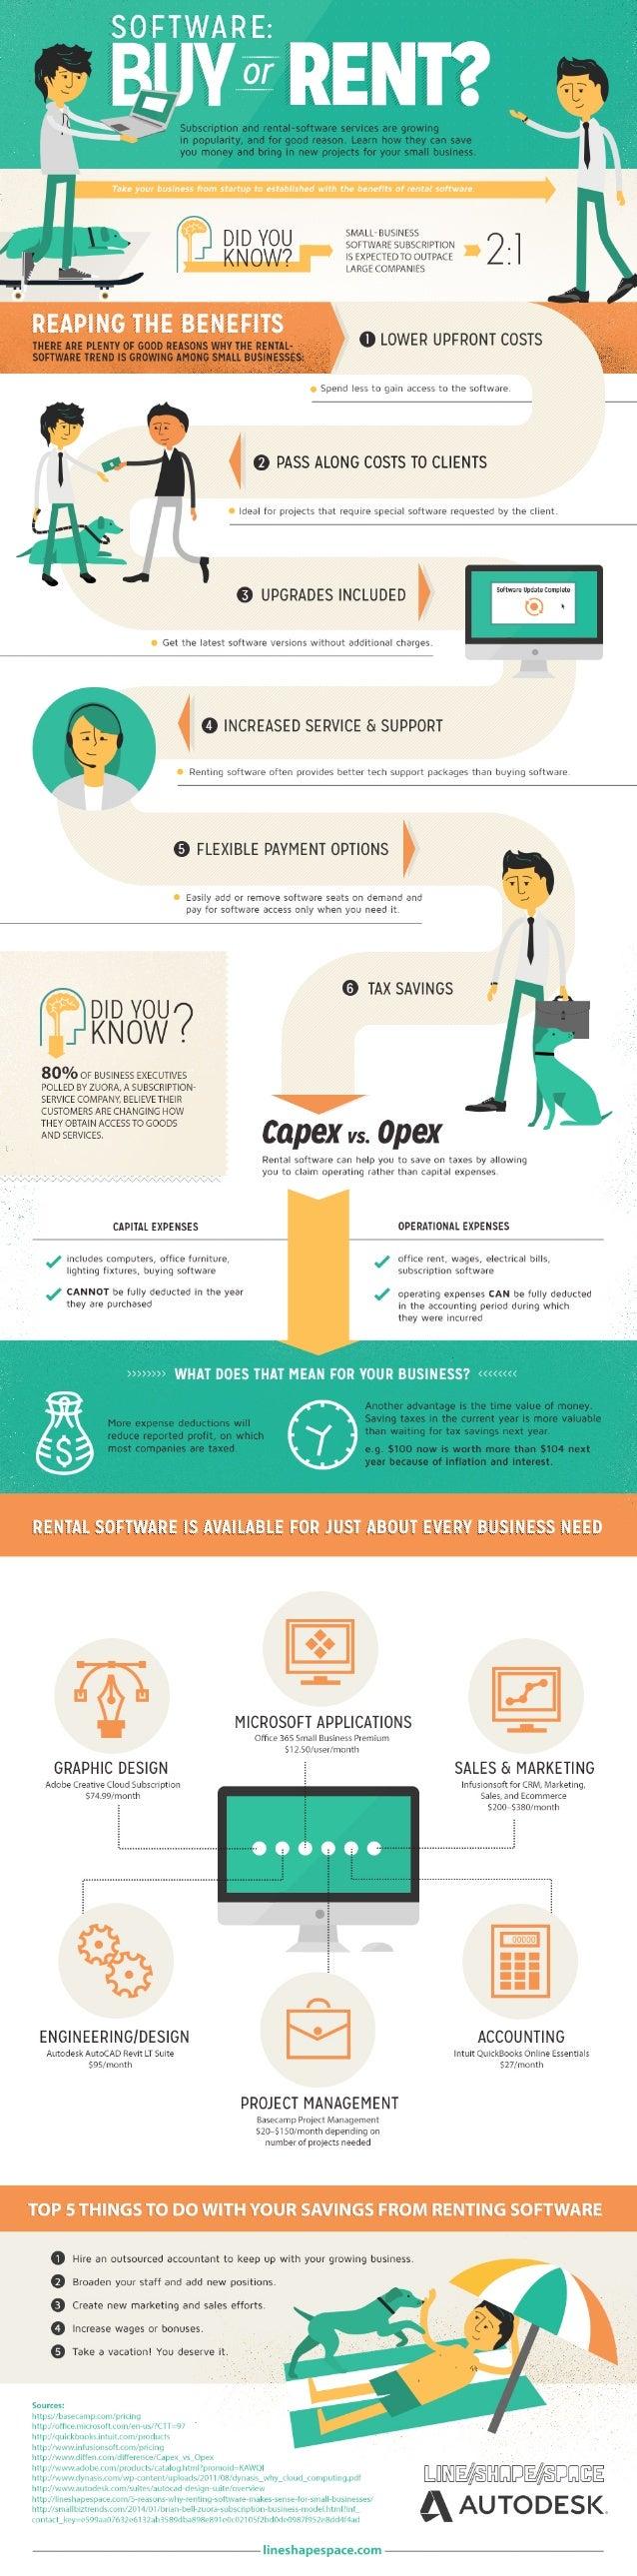 Autodesk software-rental-infographic